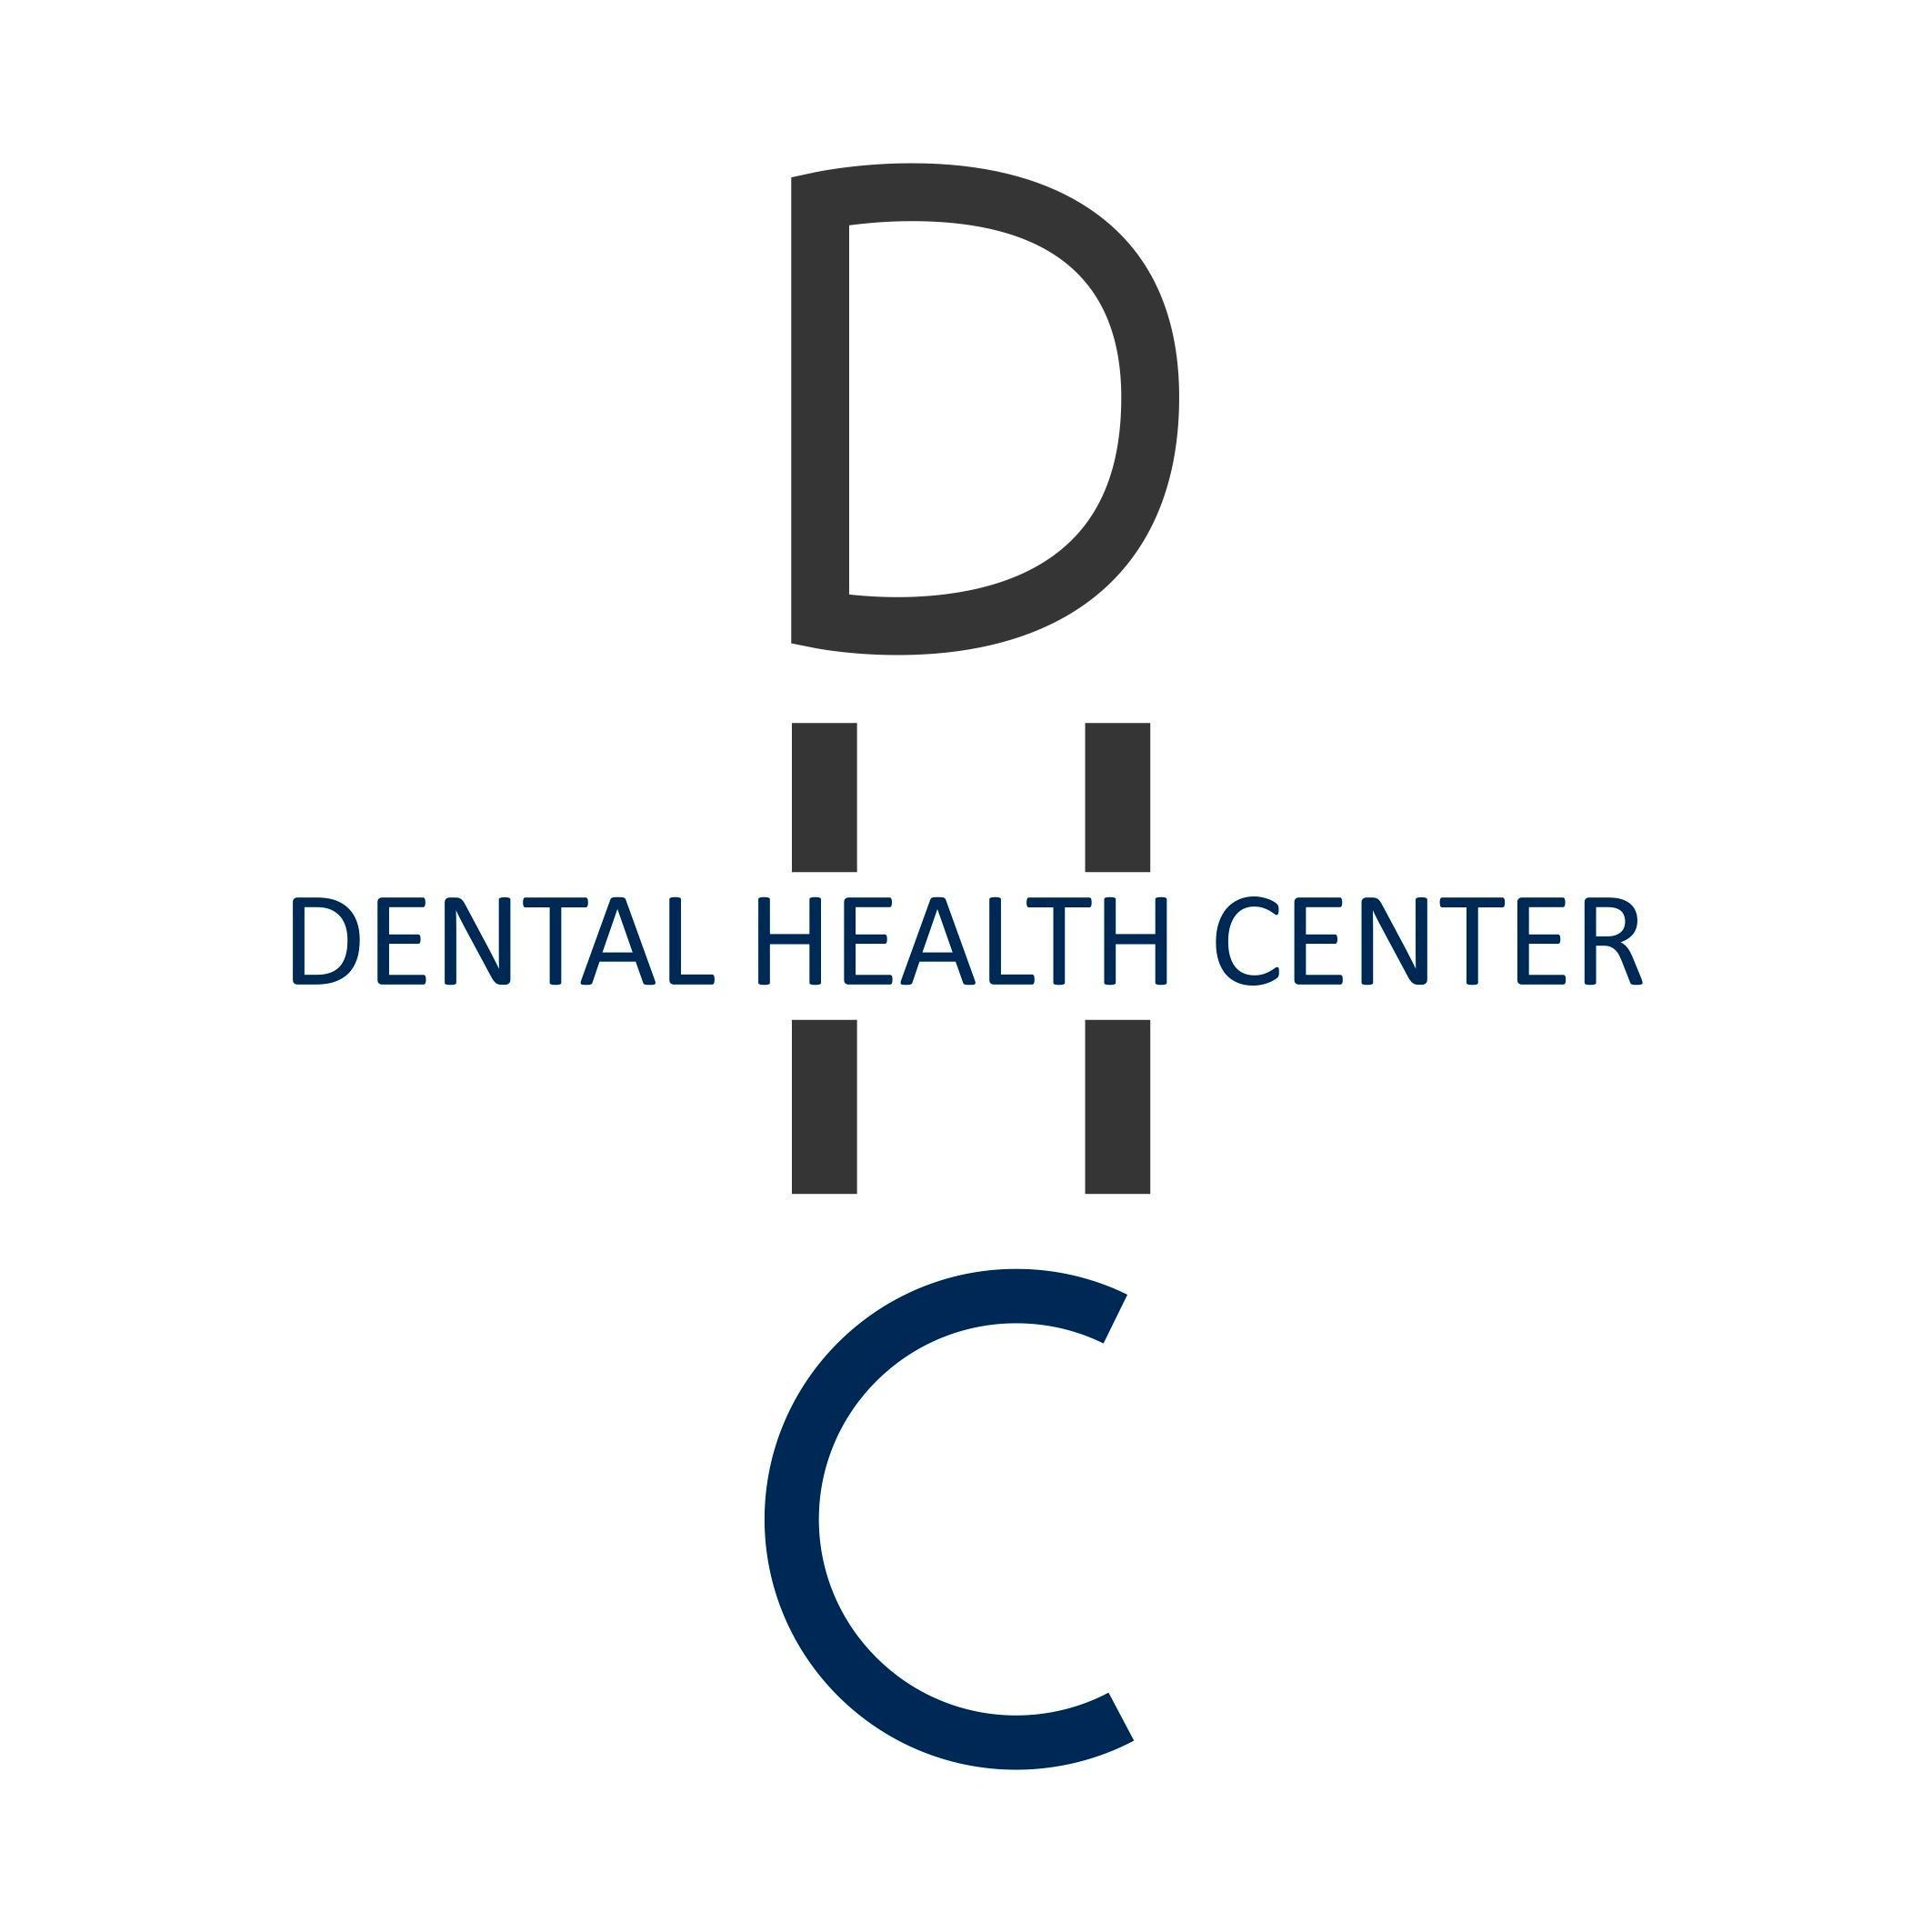 Dental Health Center Coral Gables